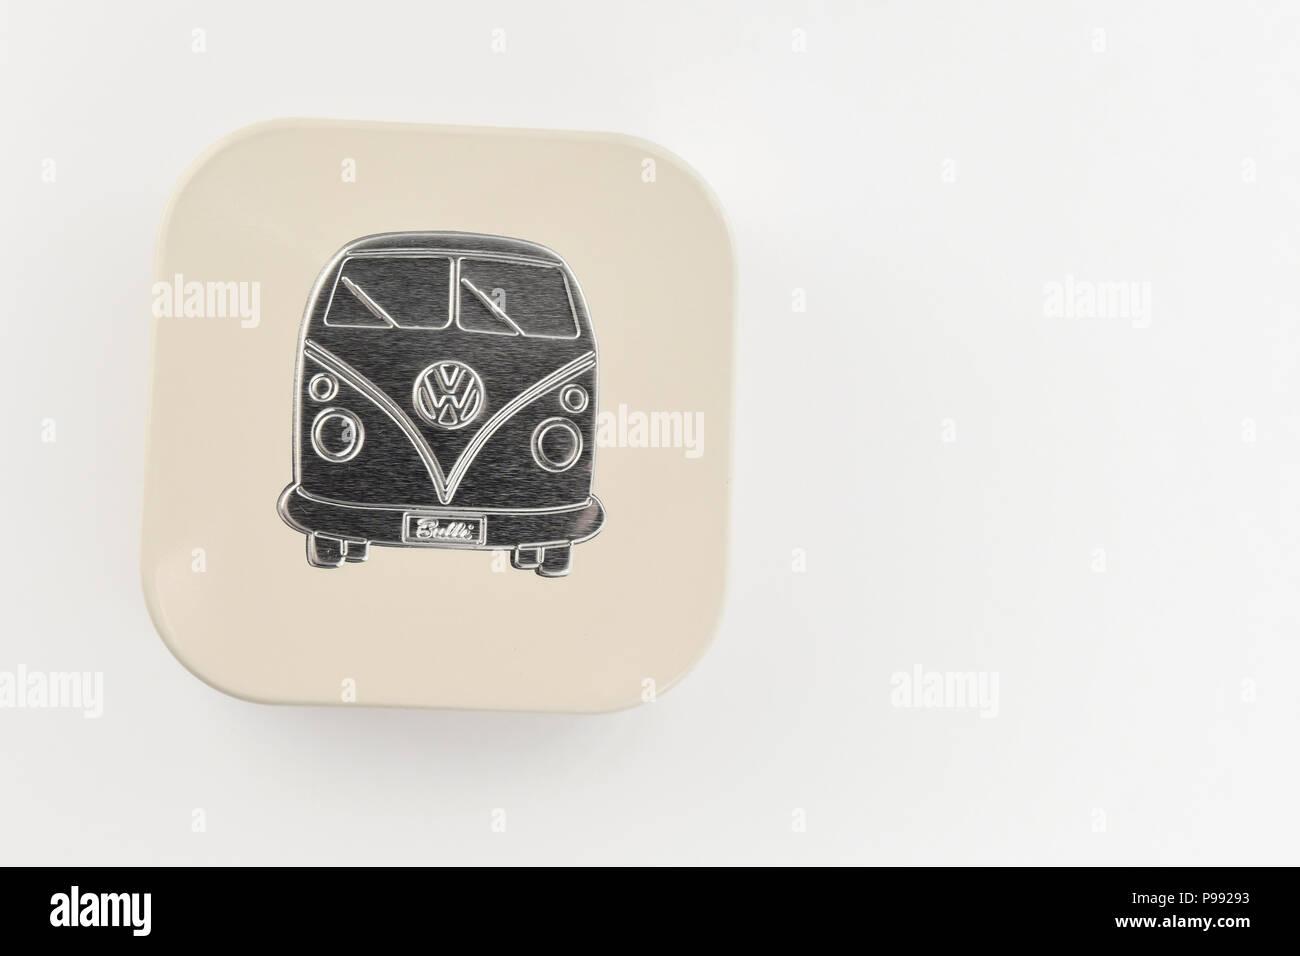 vw bulli split screen campervan on metal tin - vw merchandise - Stock Image